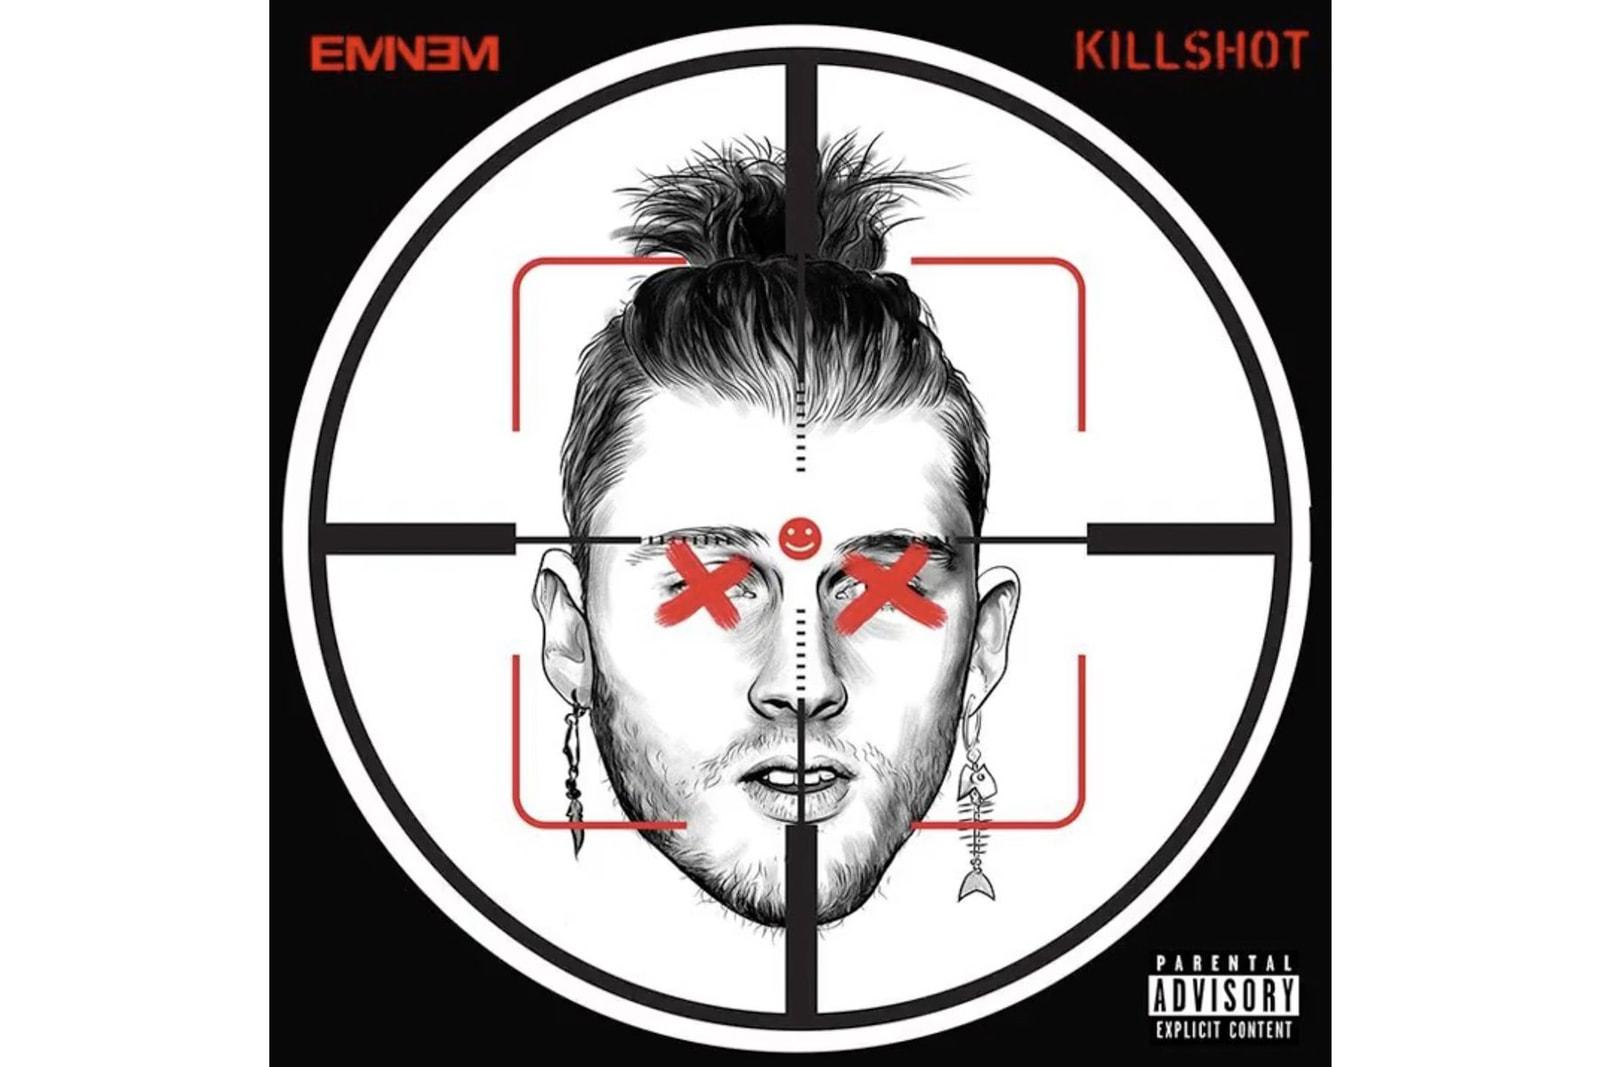 HYPEBEAST 編集部員が選ぶ注目音楽リリース 5 選 Vol.5(2018/9/10-16) ハイプビースト HYPEBEAST MUSIC PICKS, Aphex Twin, Noname, Khalid, joey purp, Eminem